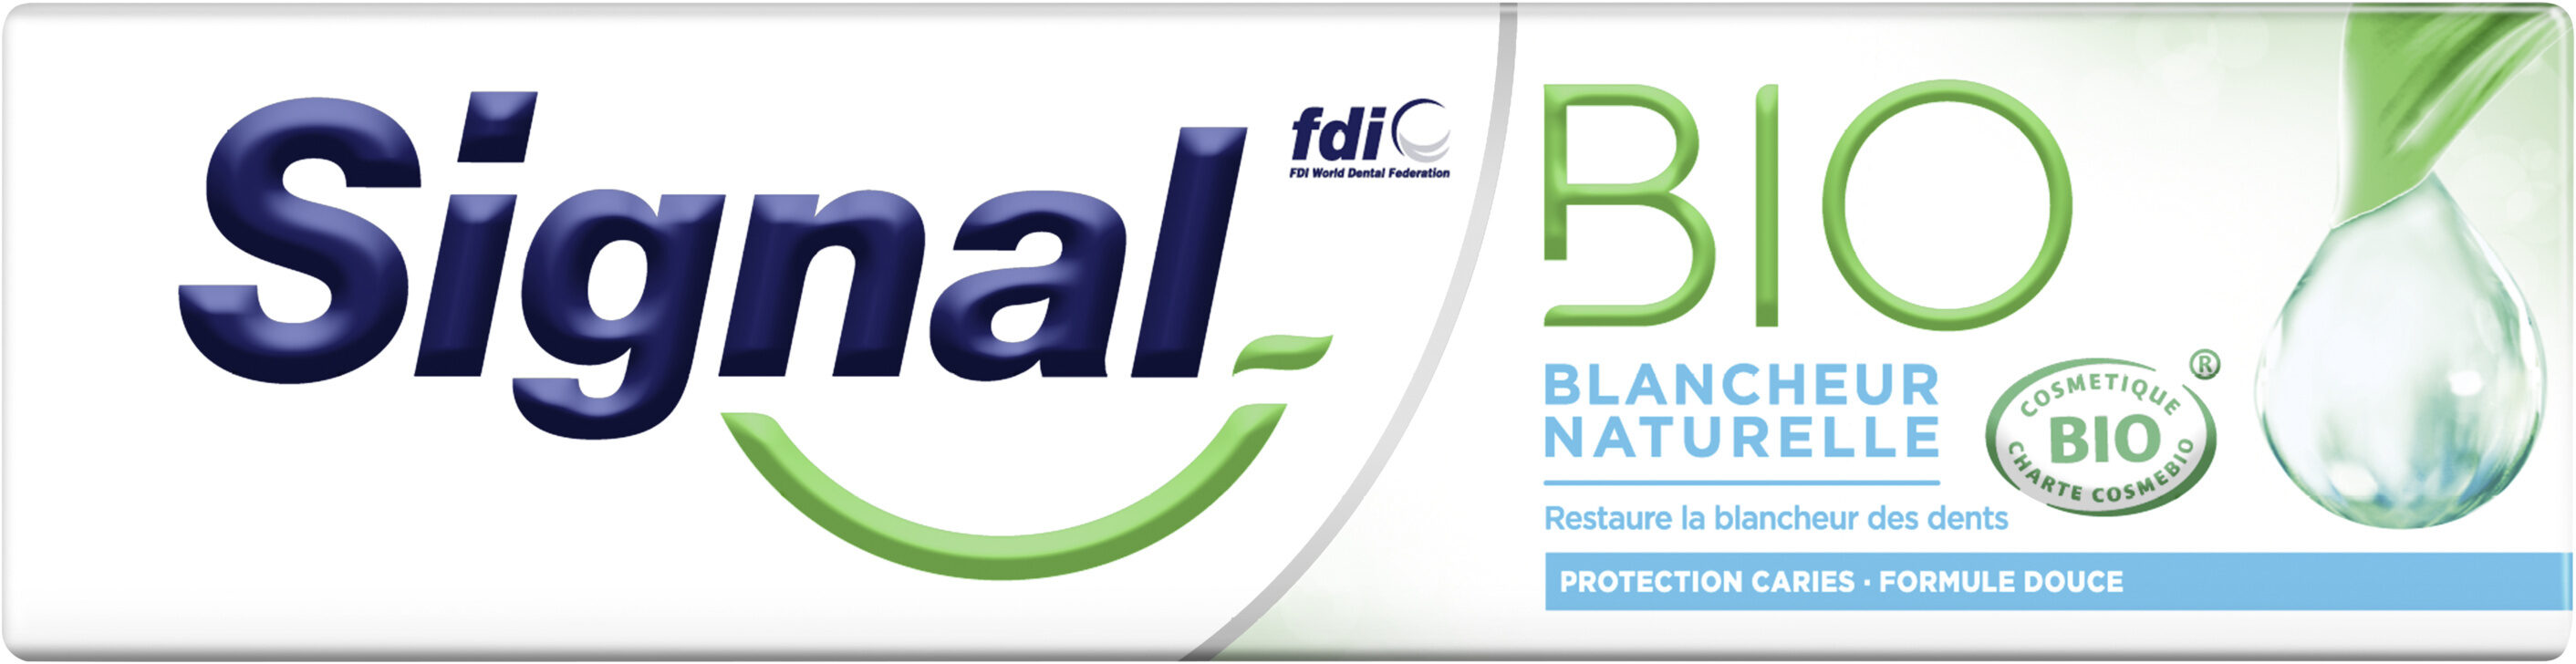 Signal Dentifrice Bio Blancheur Naturelle - Produit - fr